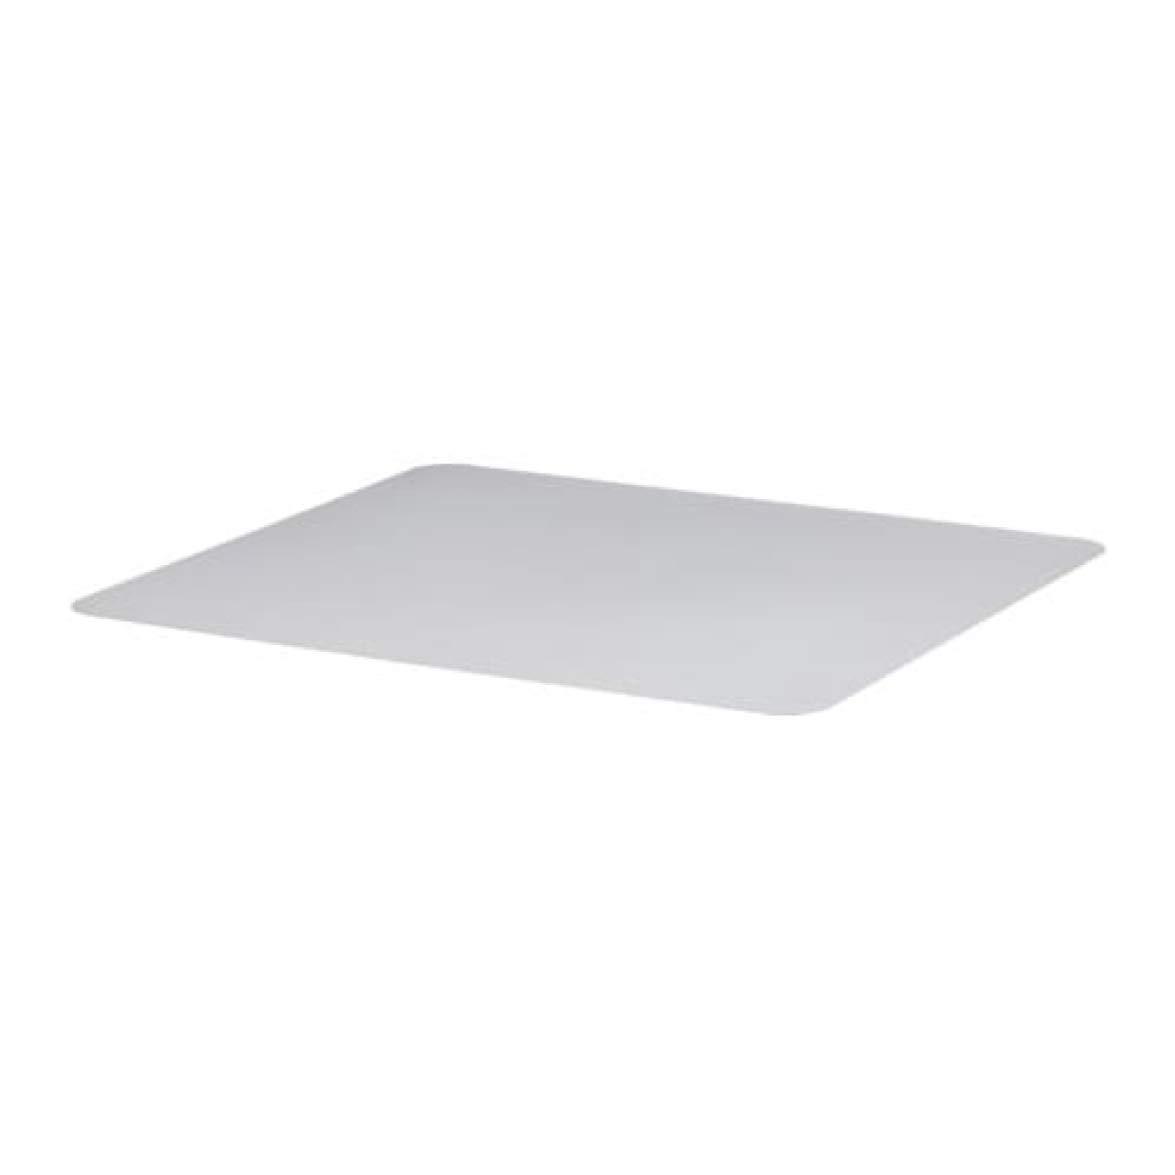 IKEA Kolon Floor Protector 448.811.00 Size 47 1/4x39 3/8''